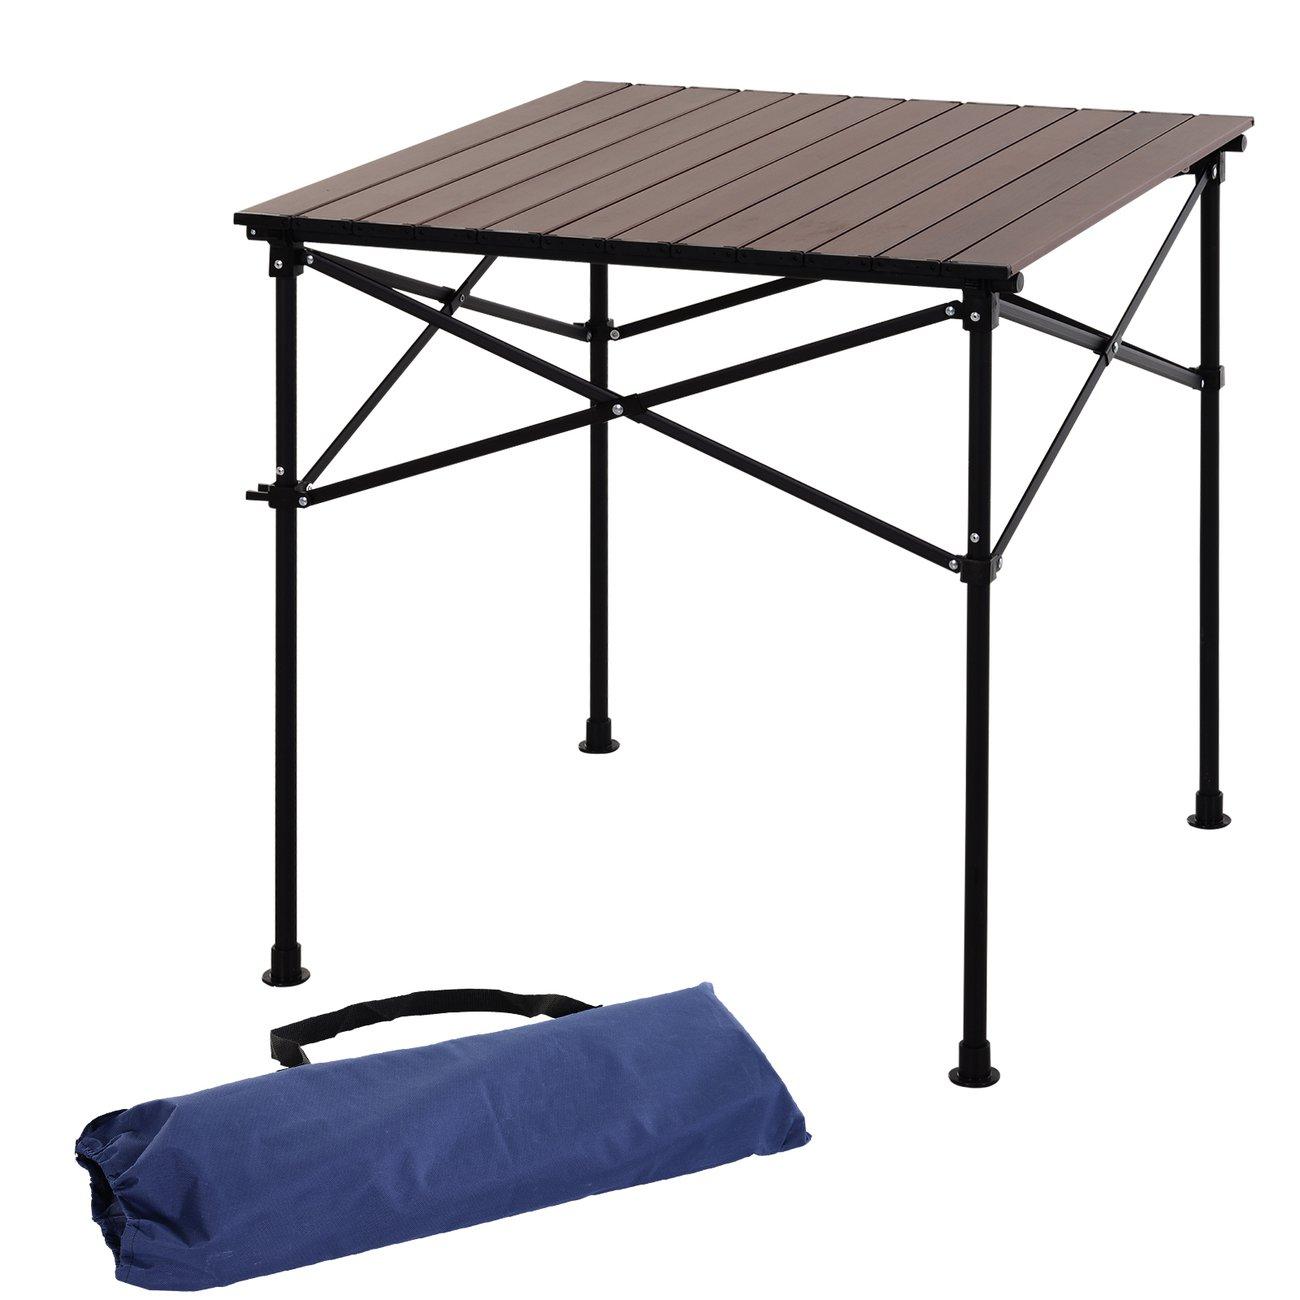 Outsunny Table Pliante En Aluminium Table De Camping Table De Jardin 4  Personnes + Sac De Transport à Table Jardin 4 Personnes